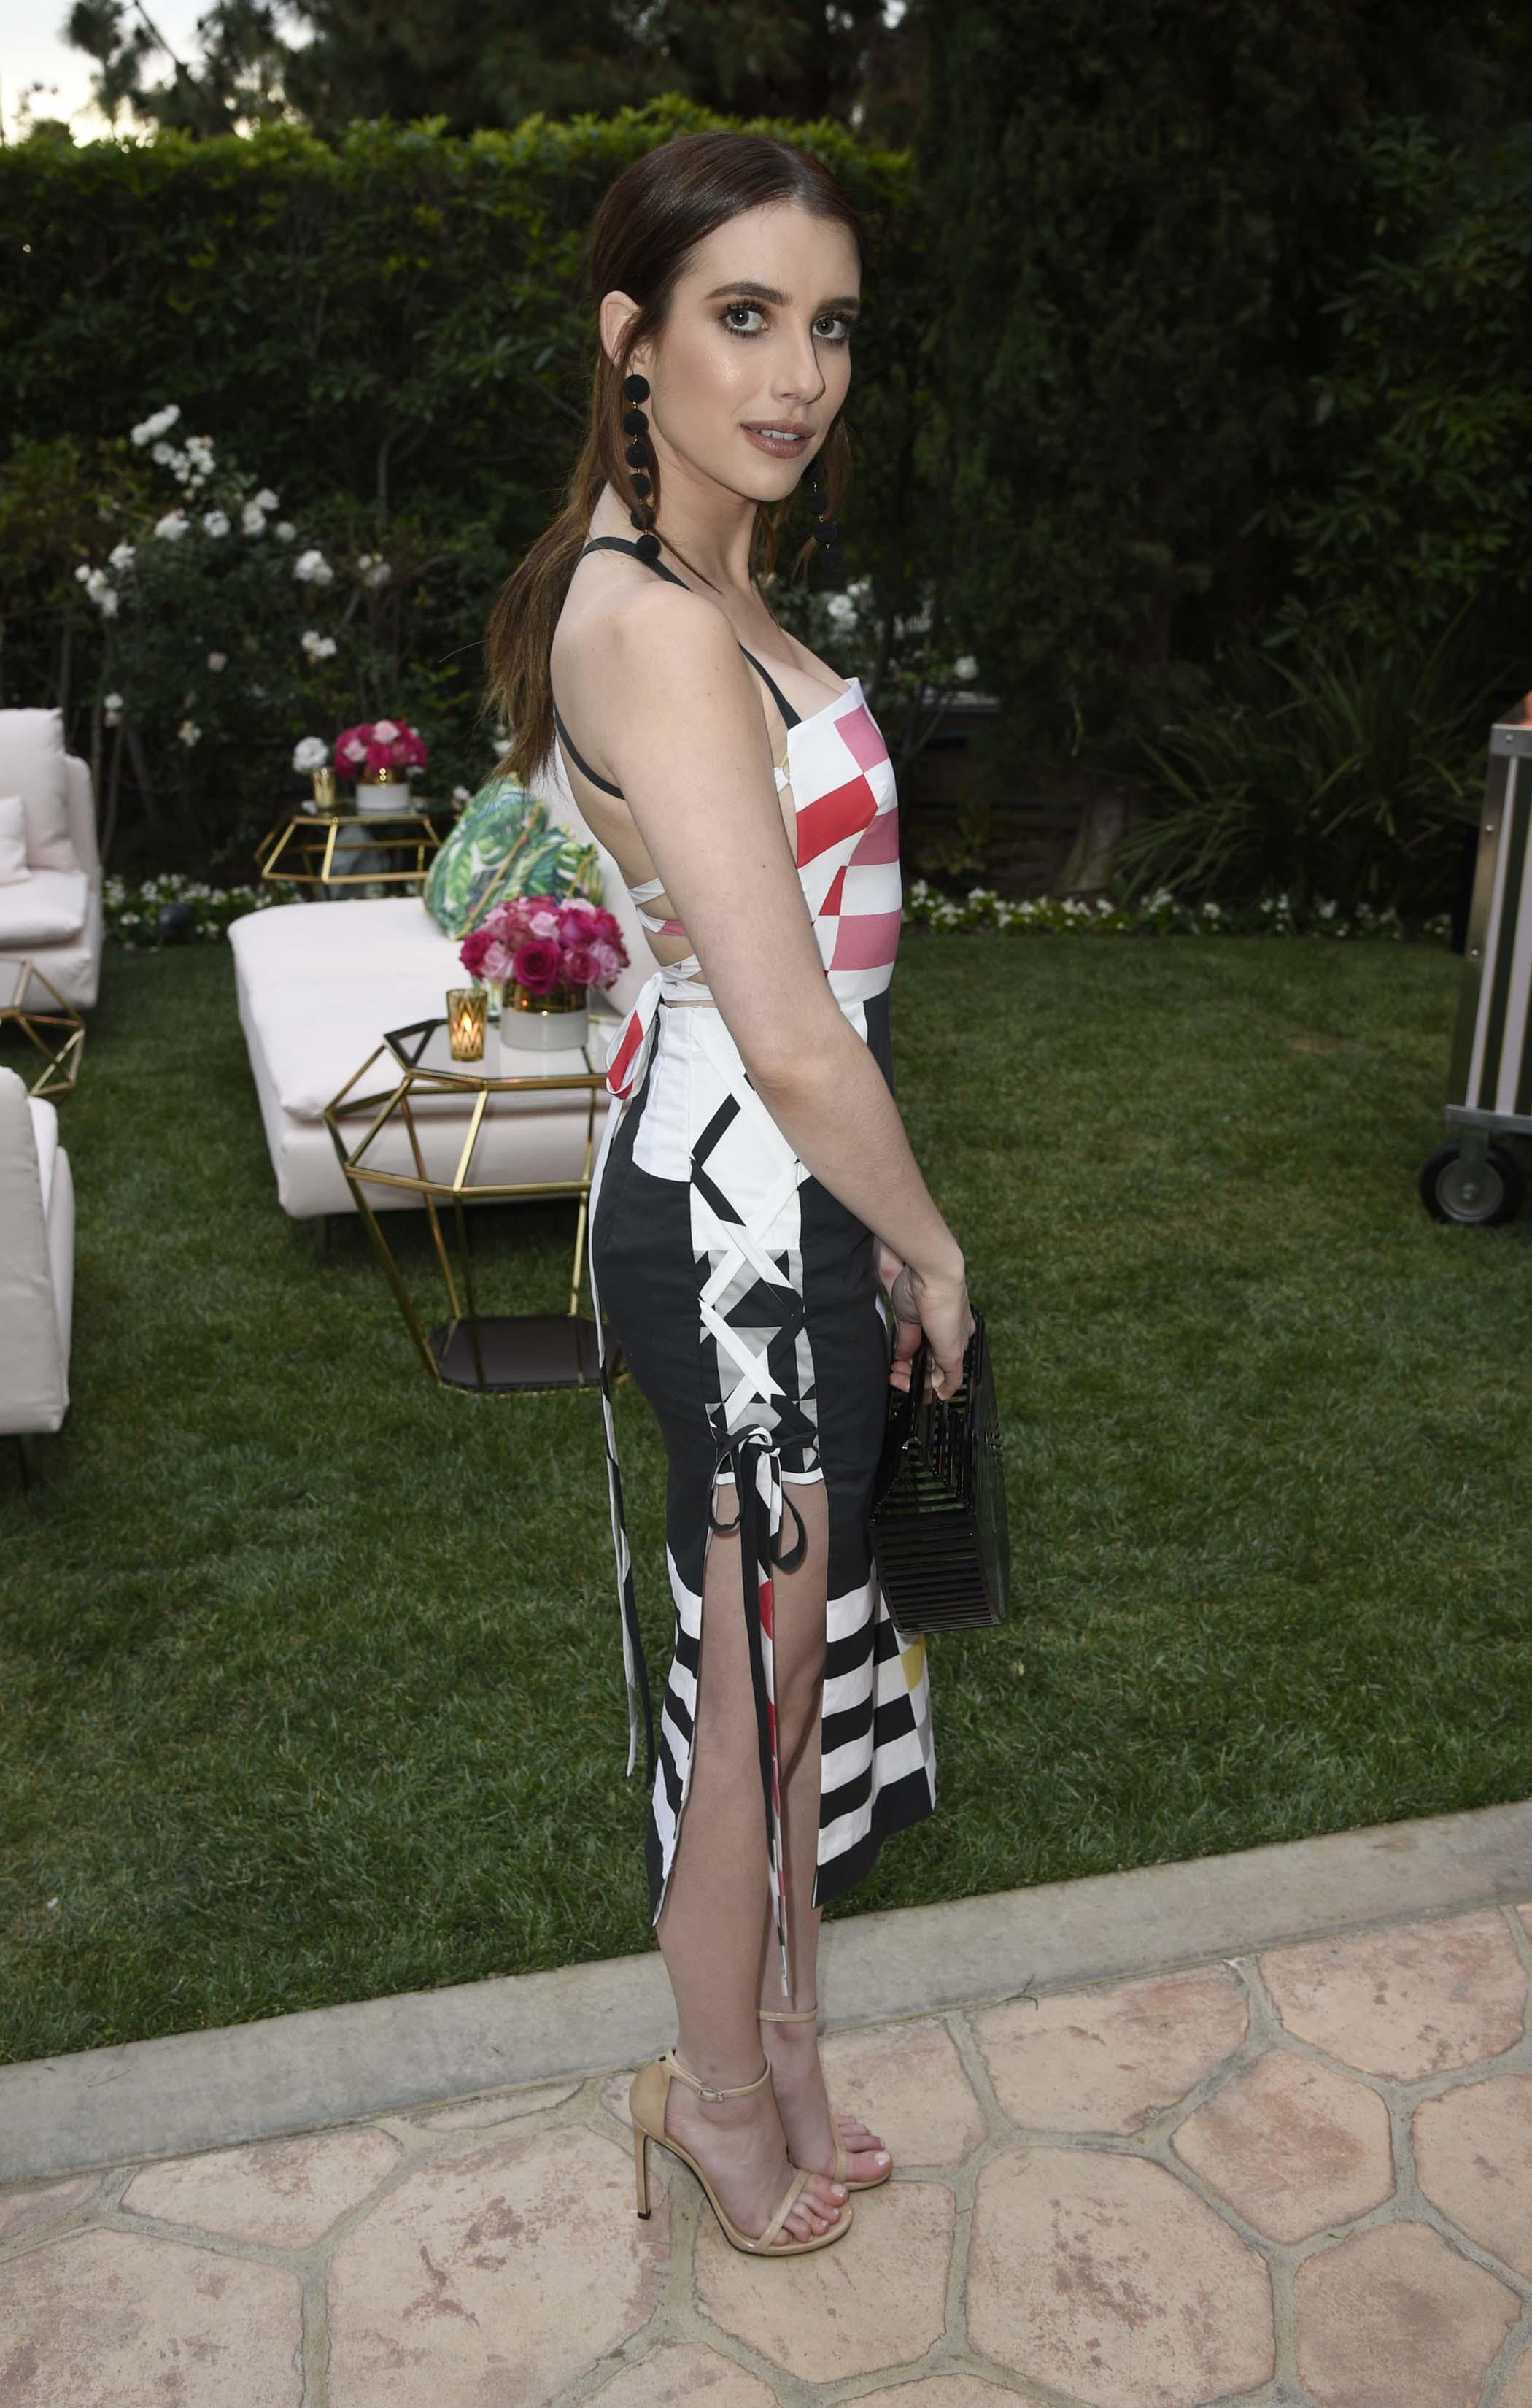 Emma Roberts at the Kim Crawford Rosé party